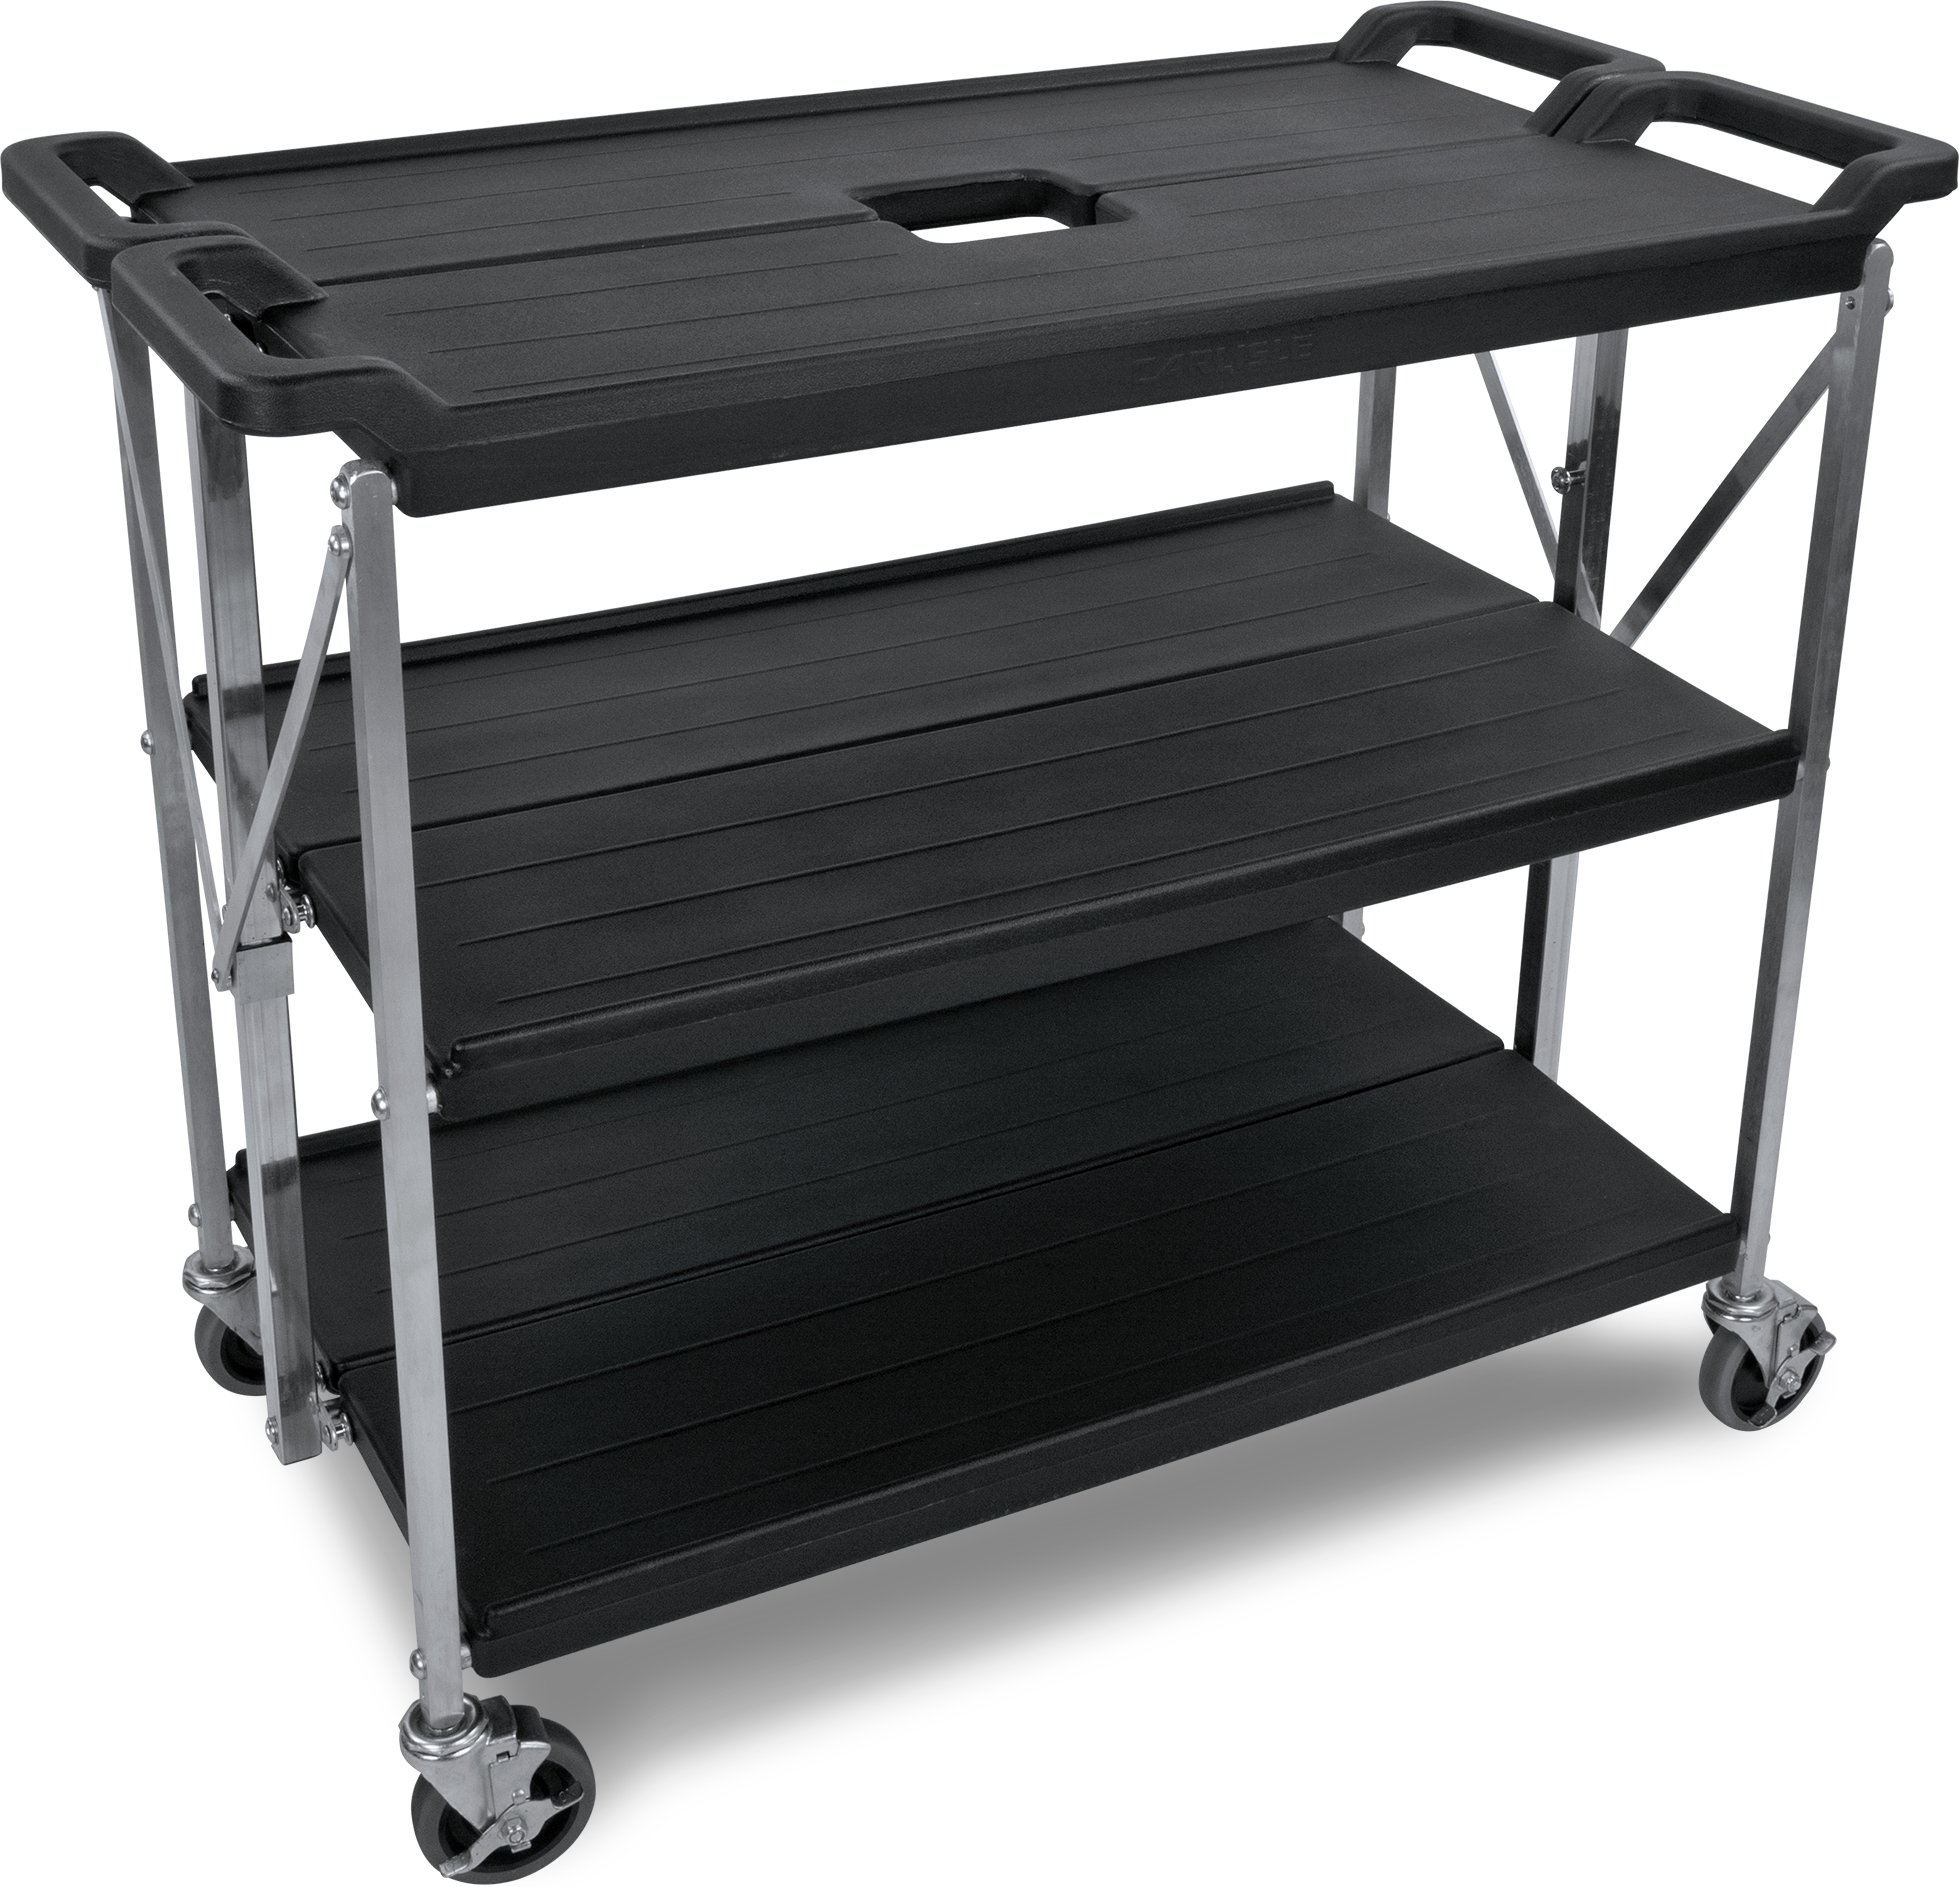 Carlisle SBC203103 Fold 'N Go Collapsible Utility Cart, 350 Pound Capacity, 31'' Length x 20'' Width Shelf, Black